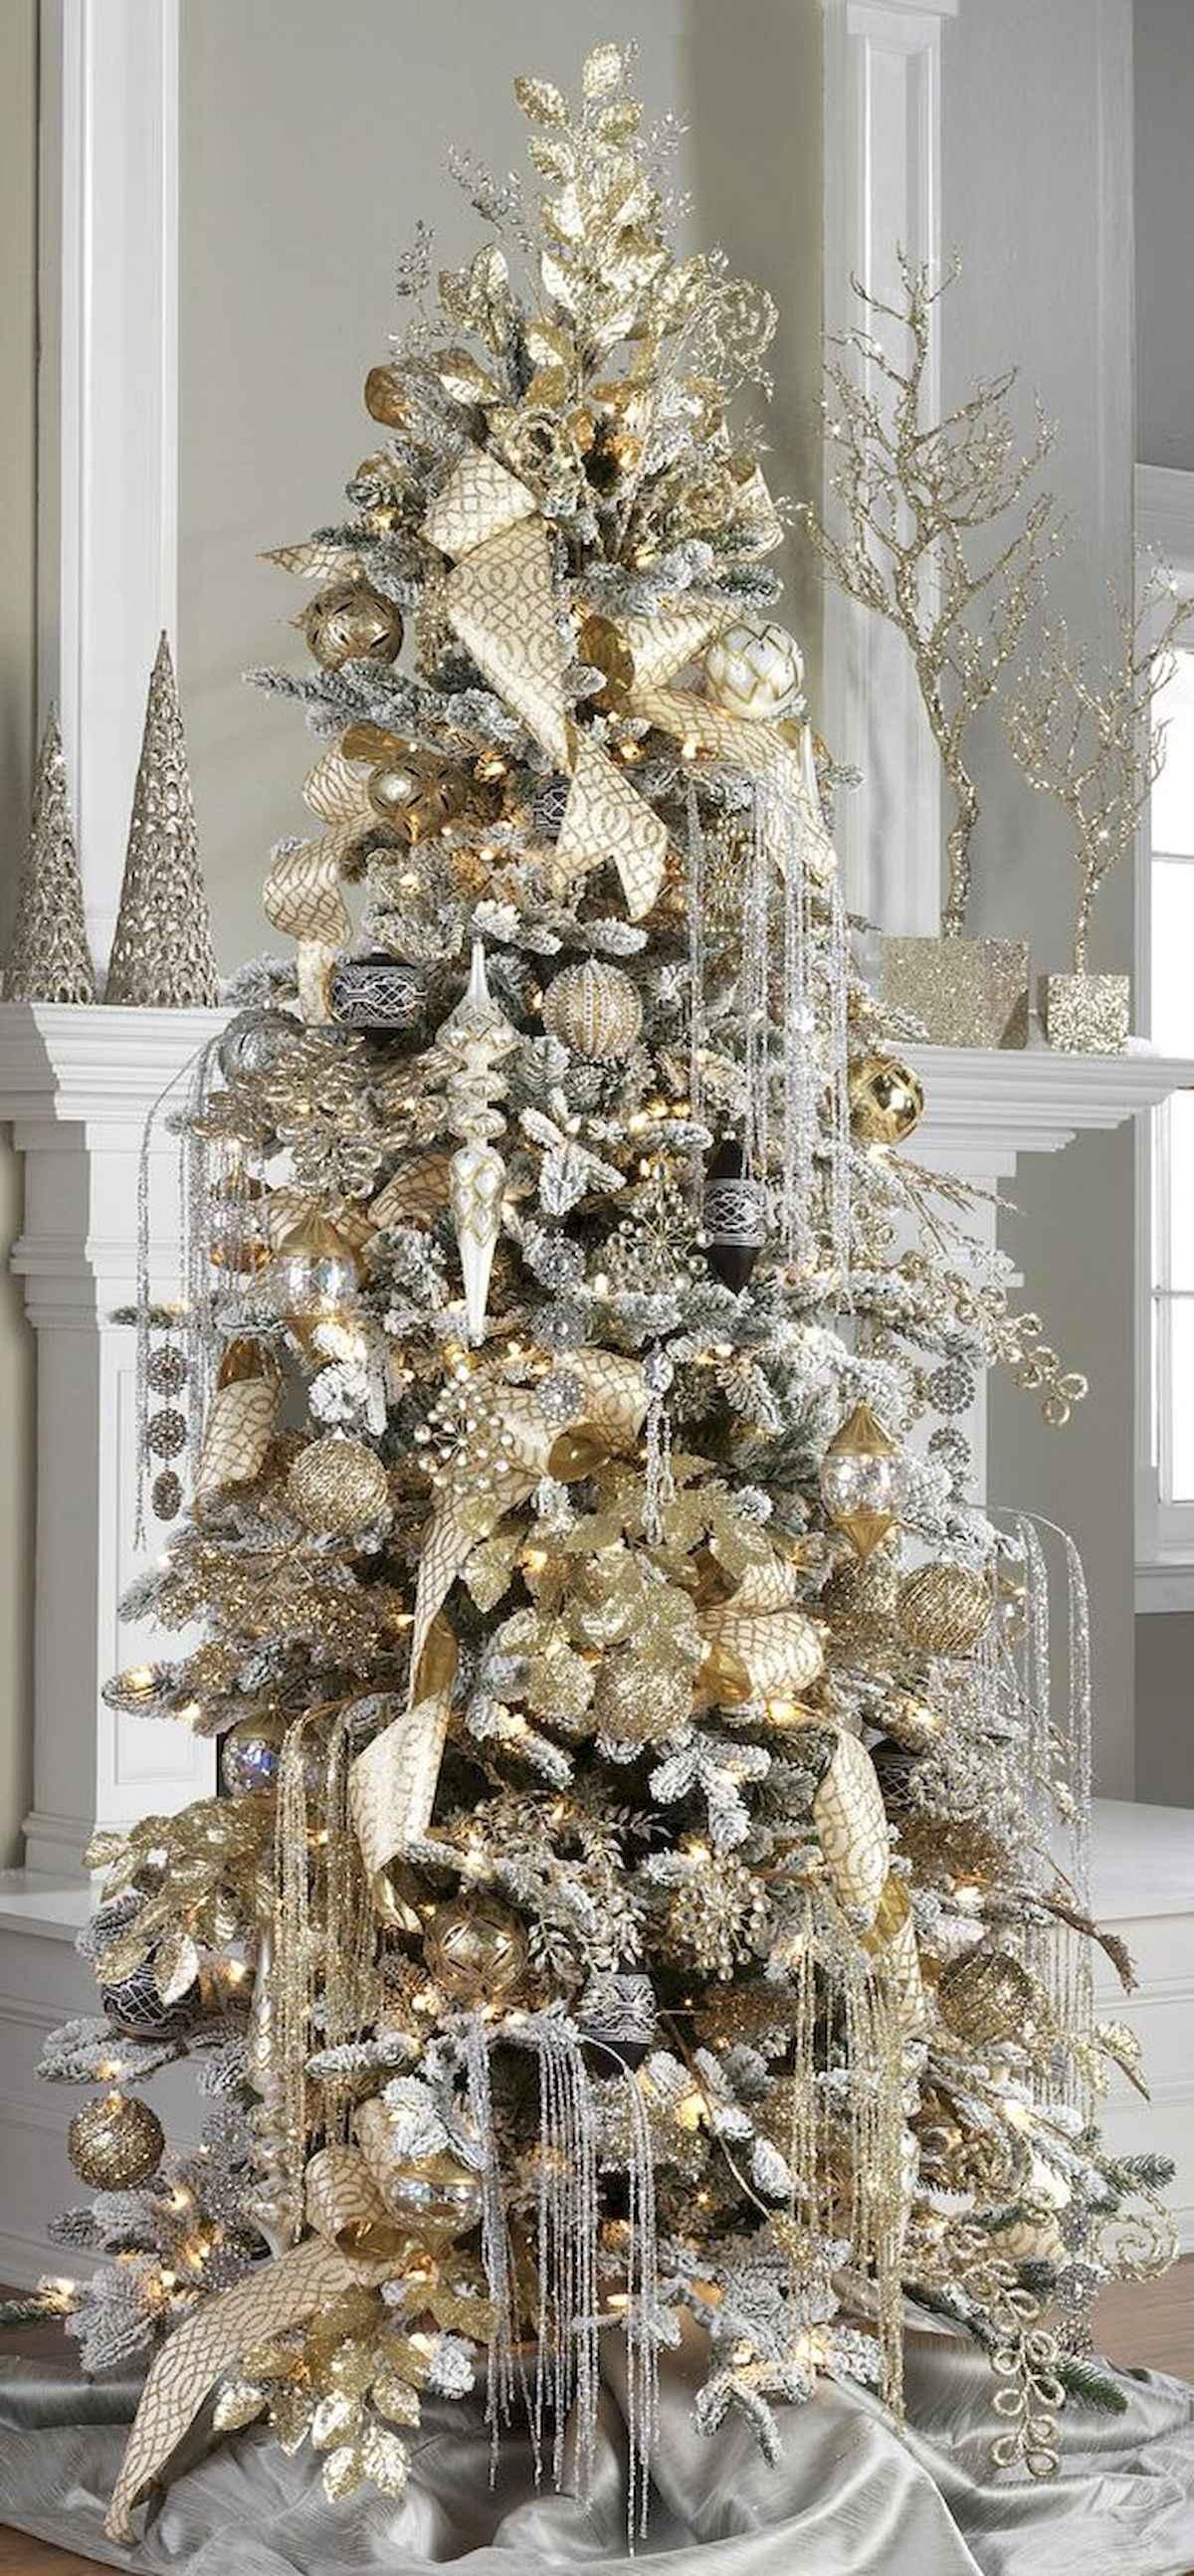 40 elegant christmas tree decorations ideas (11)